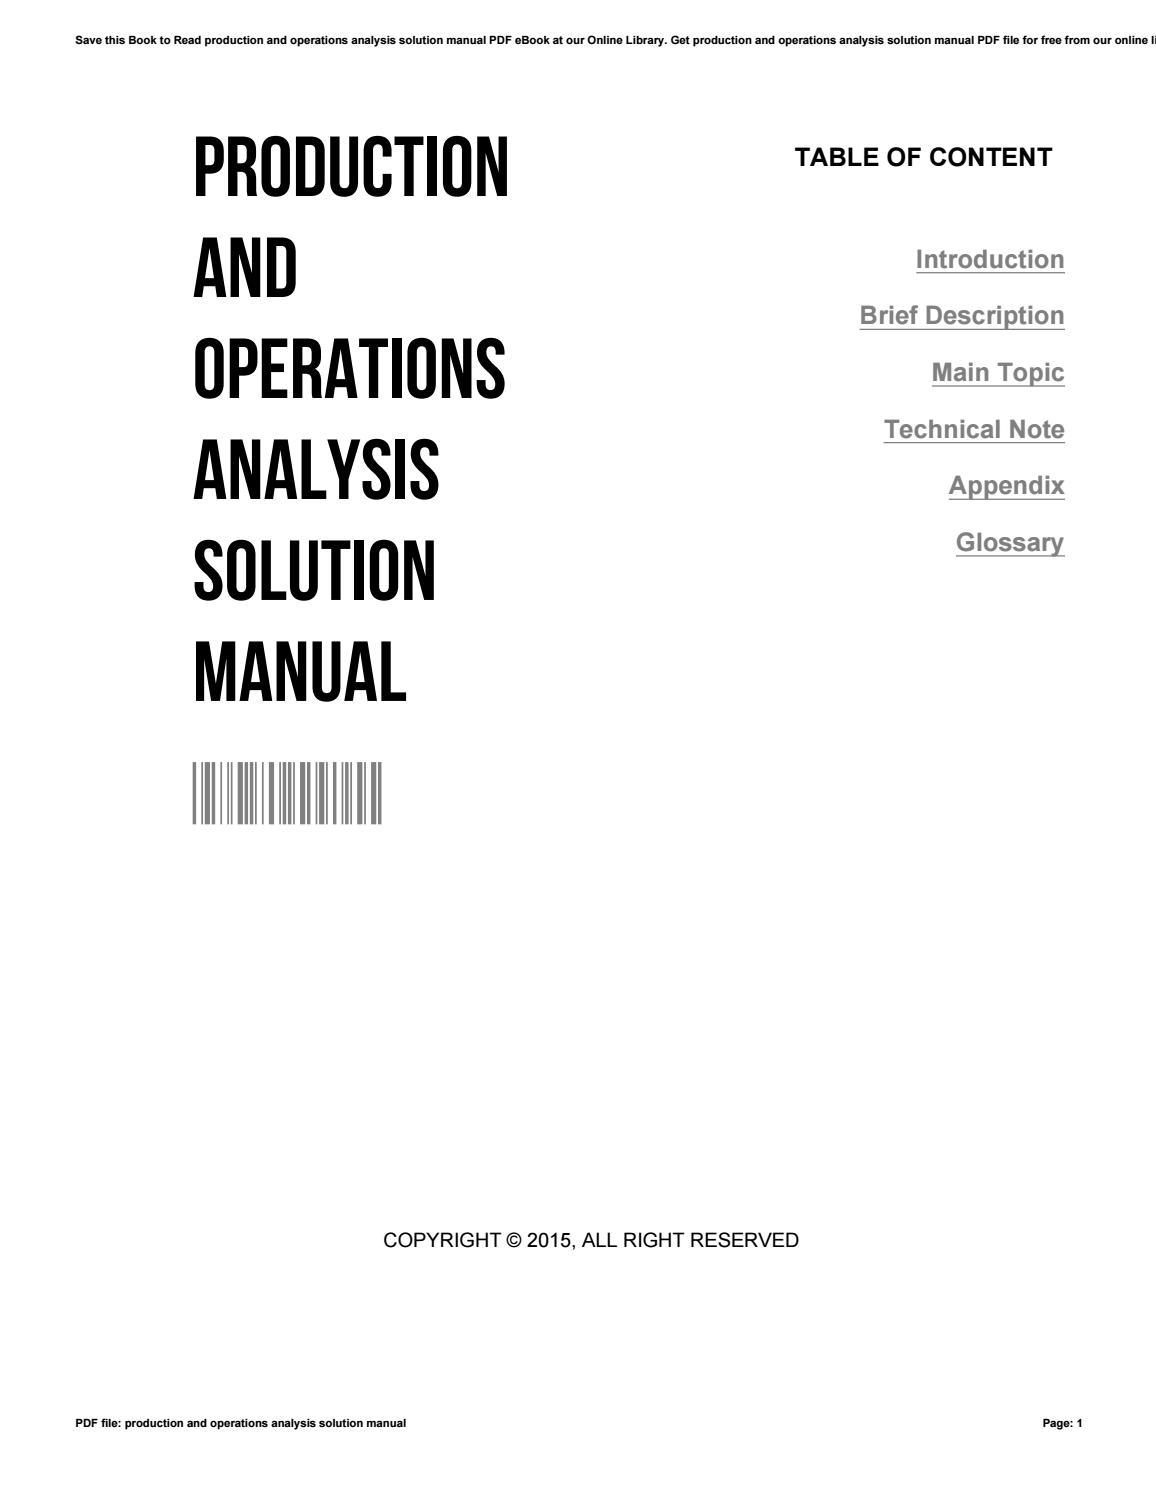 Nahmias analysis steven operations pdf and production